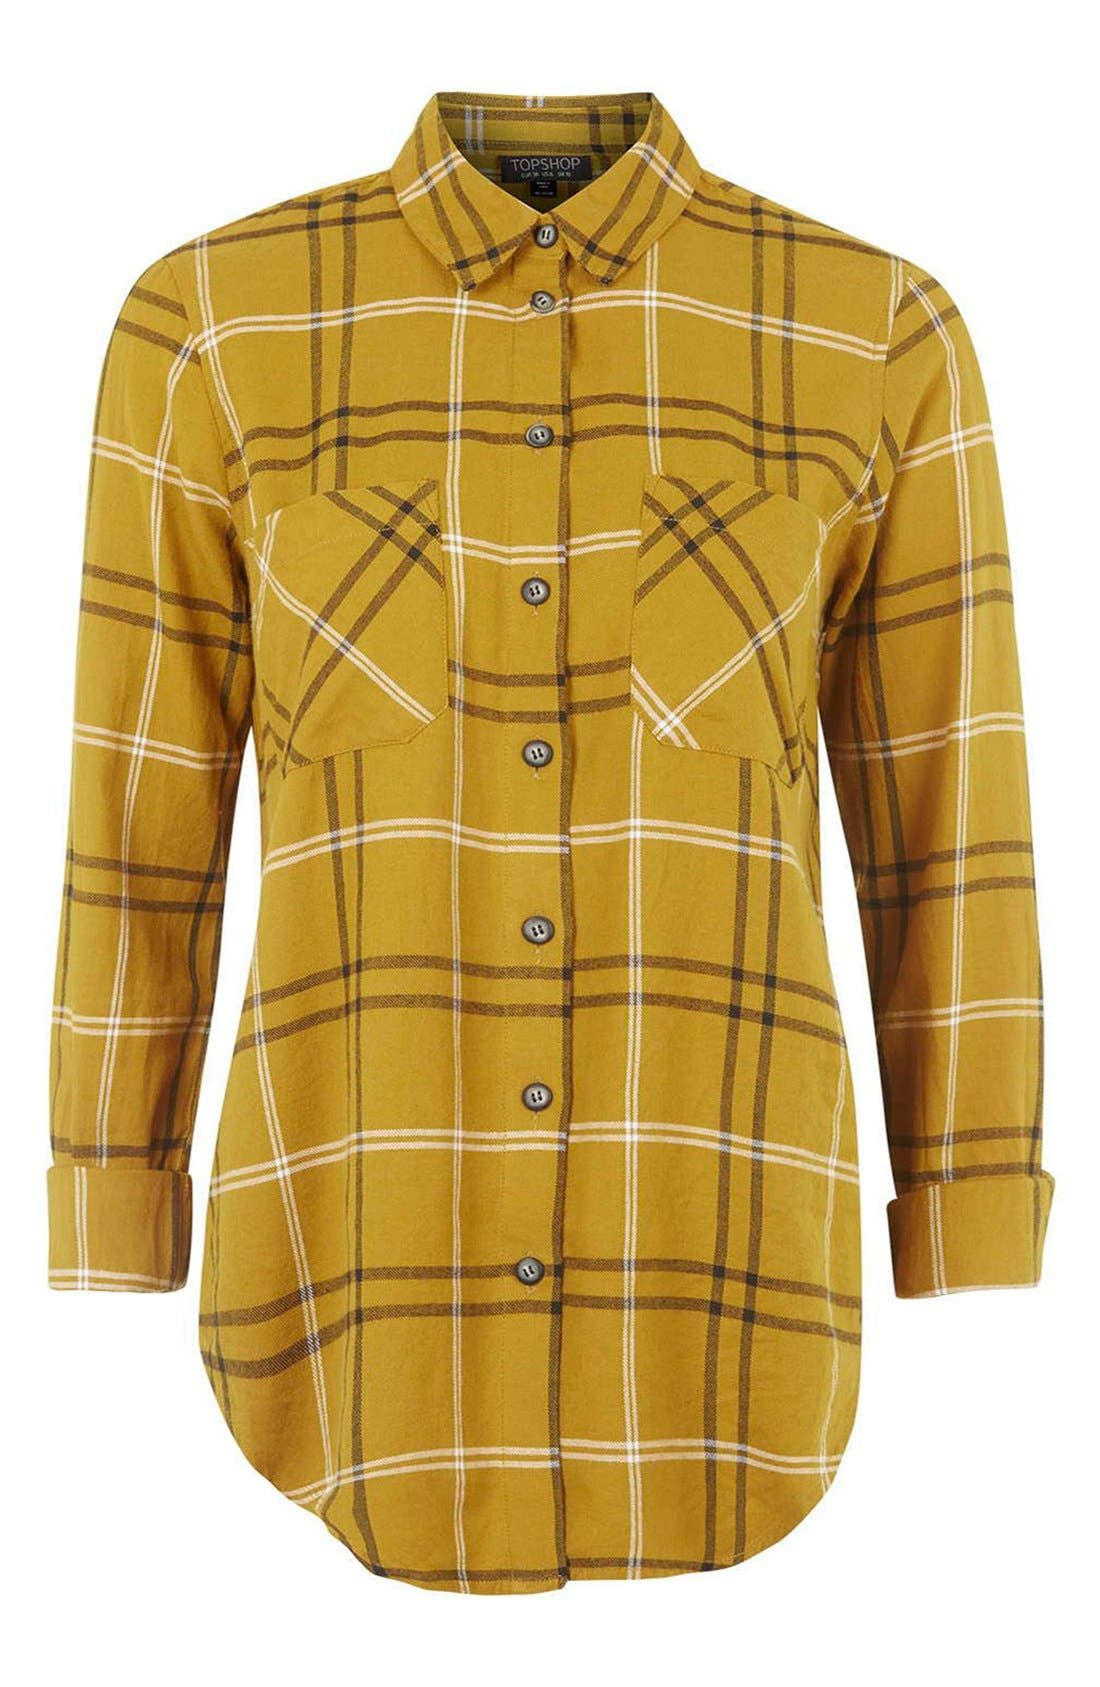 TOPSHOP, 'Billie' Check Button FrontBoyfriend Shirt, Alternate thumbnail 5, color, 701